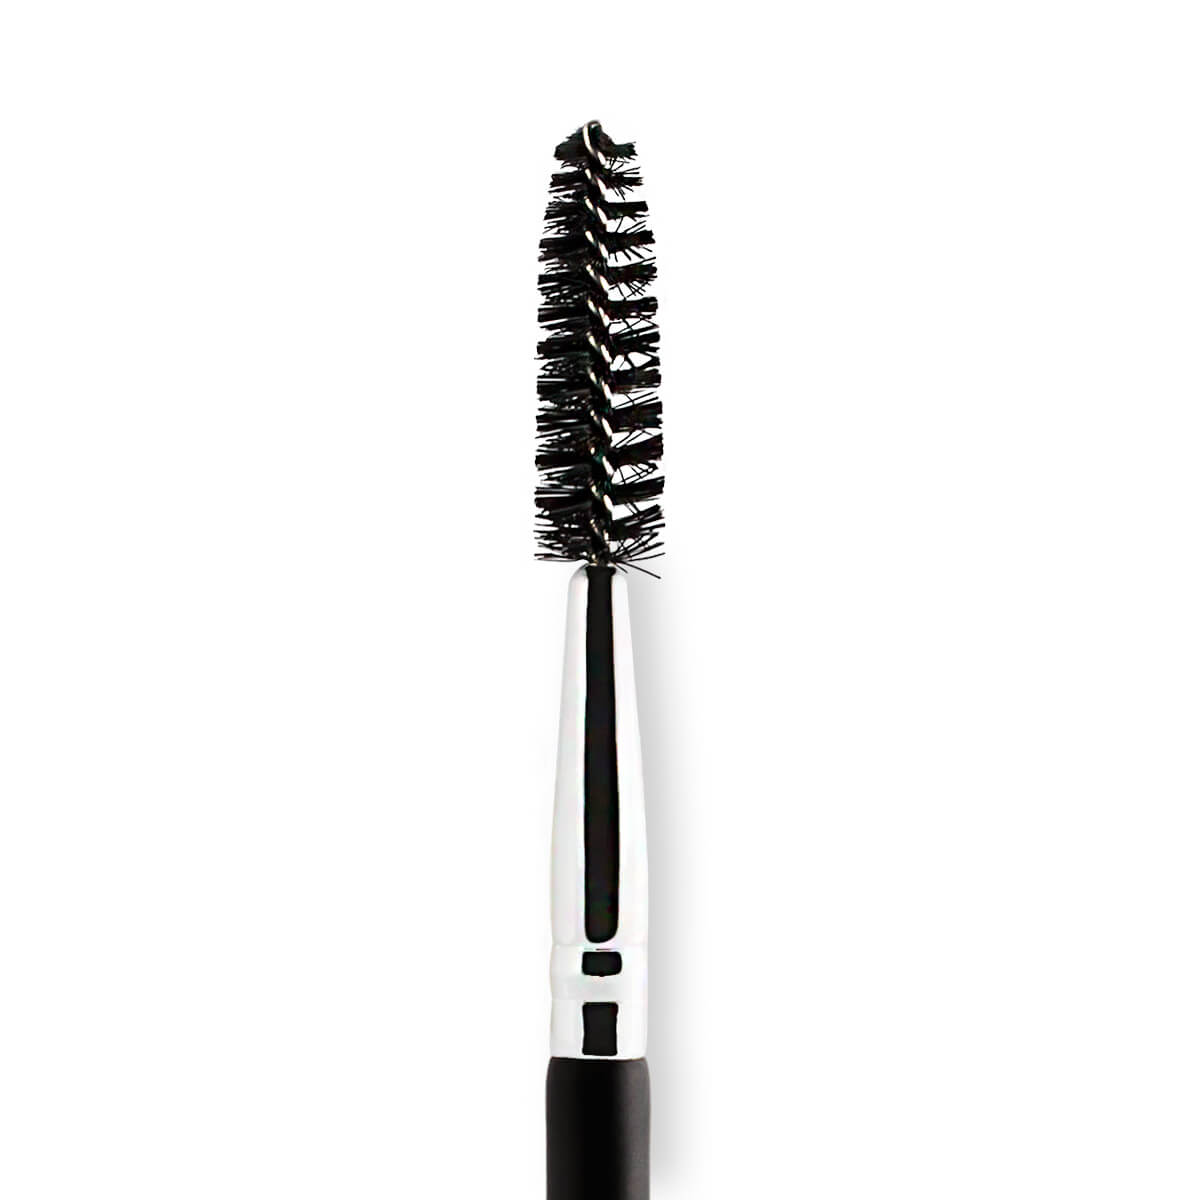 S127 - Pincel Duplo / Escova E Chanfrado Profissional Sffumato Beauty